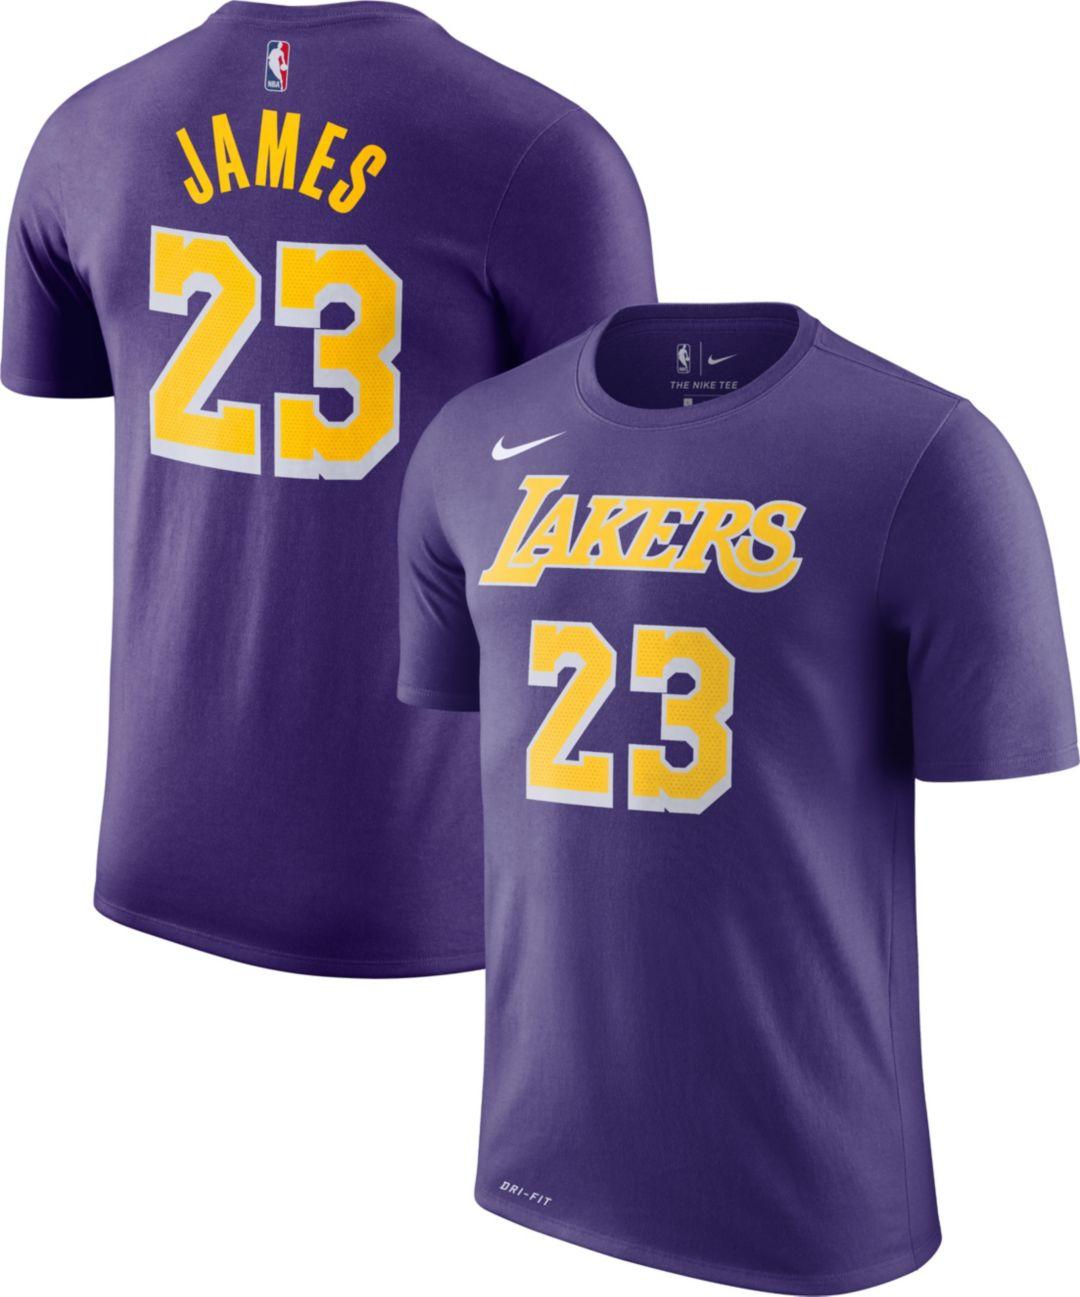 7de11fb9e517 Nike Youth Los Angeles Lakers LeBron James Dri-FIT Purple T-Shirt.  noImageFound. Previous